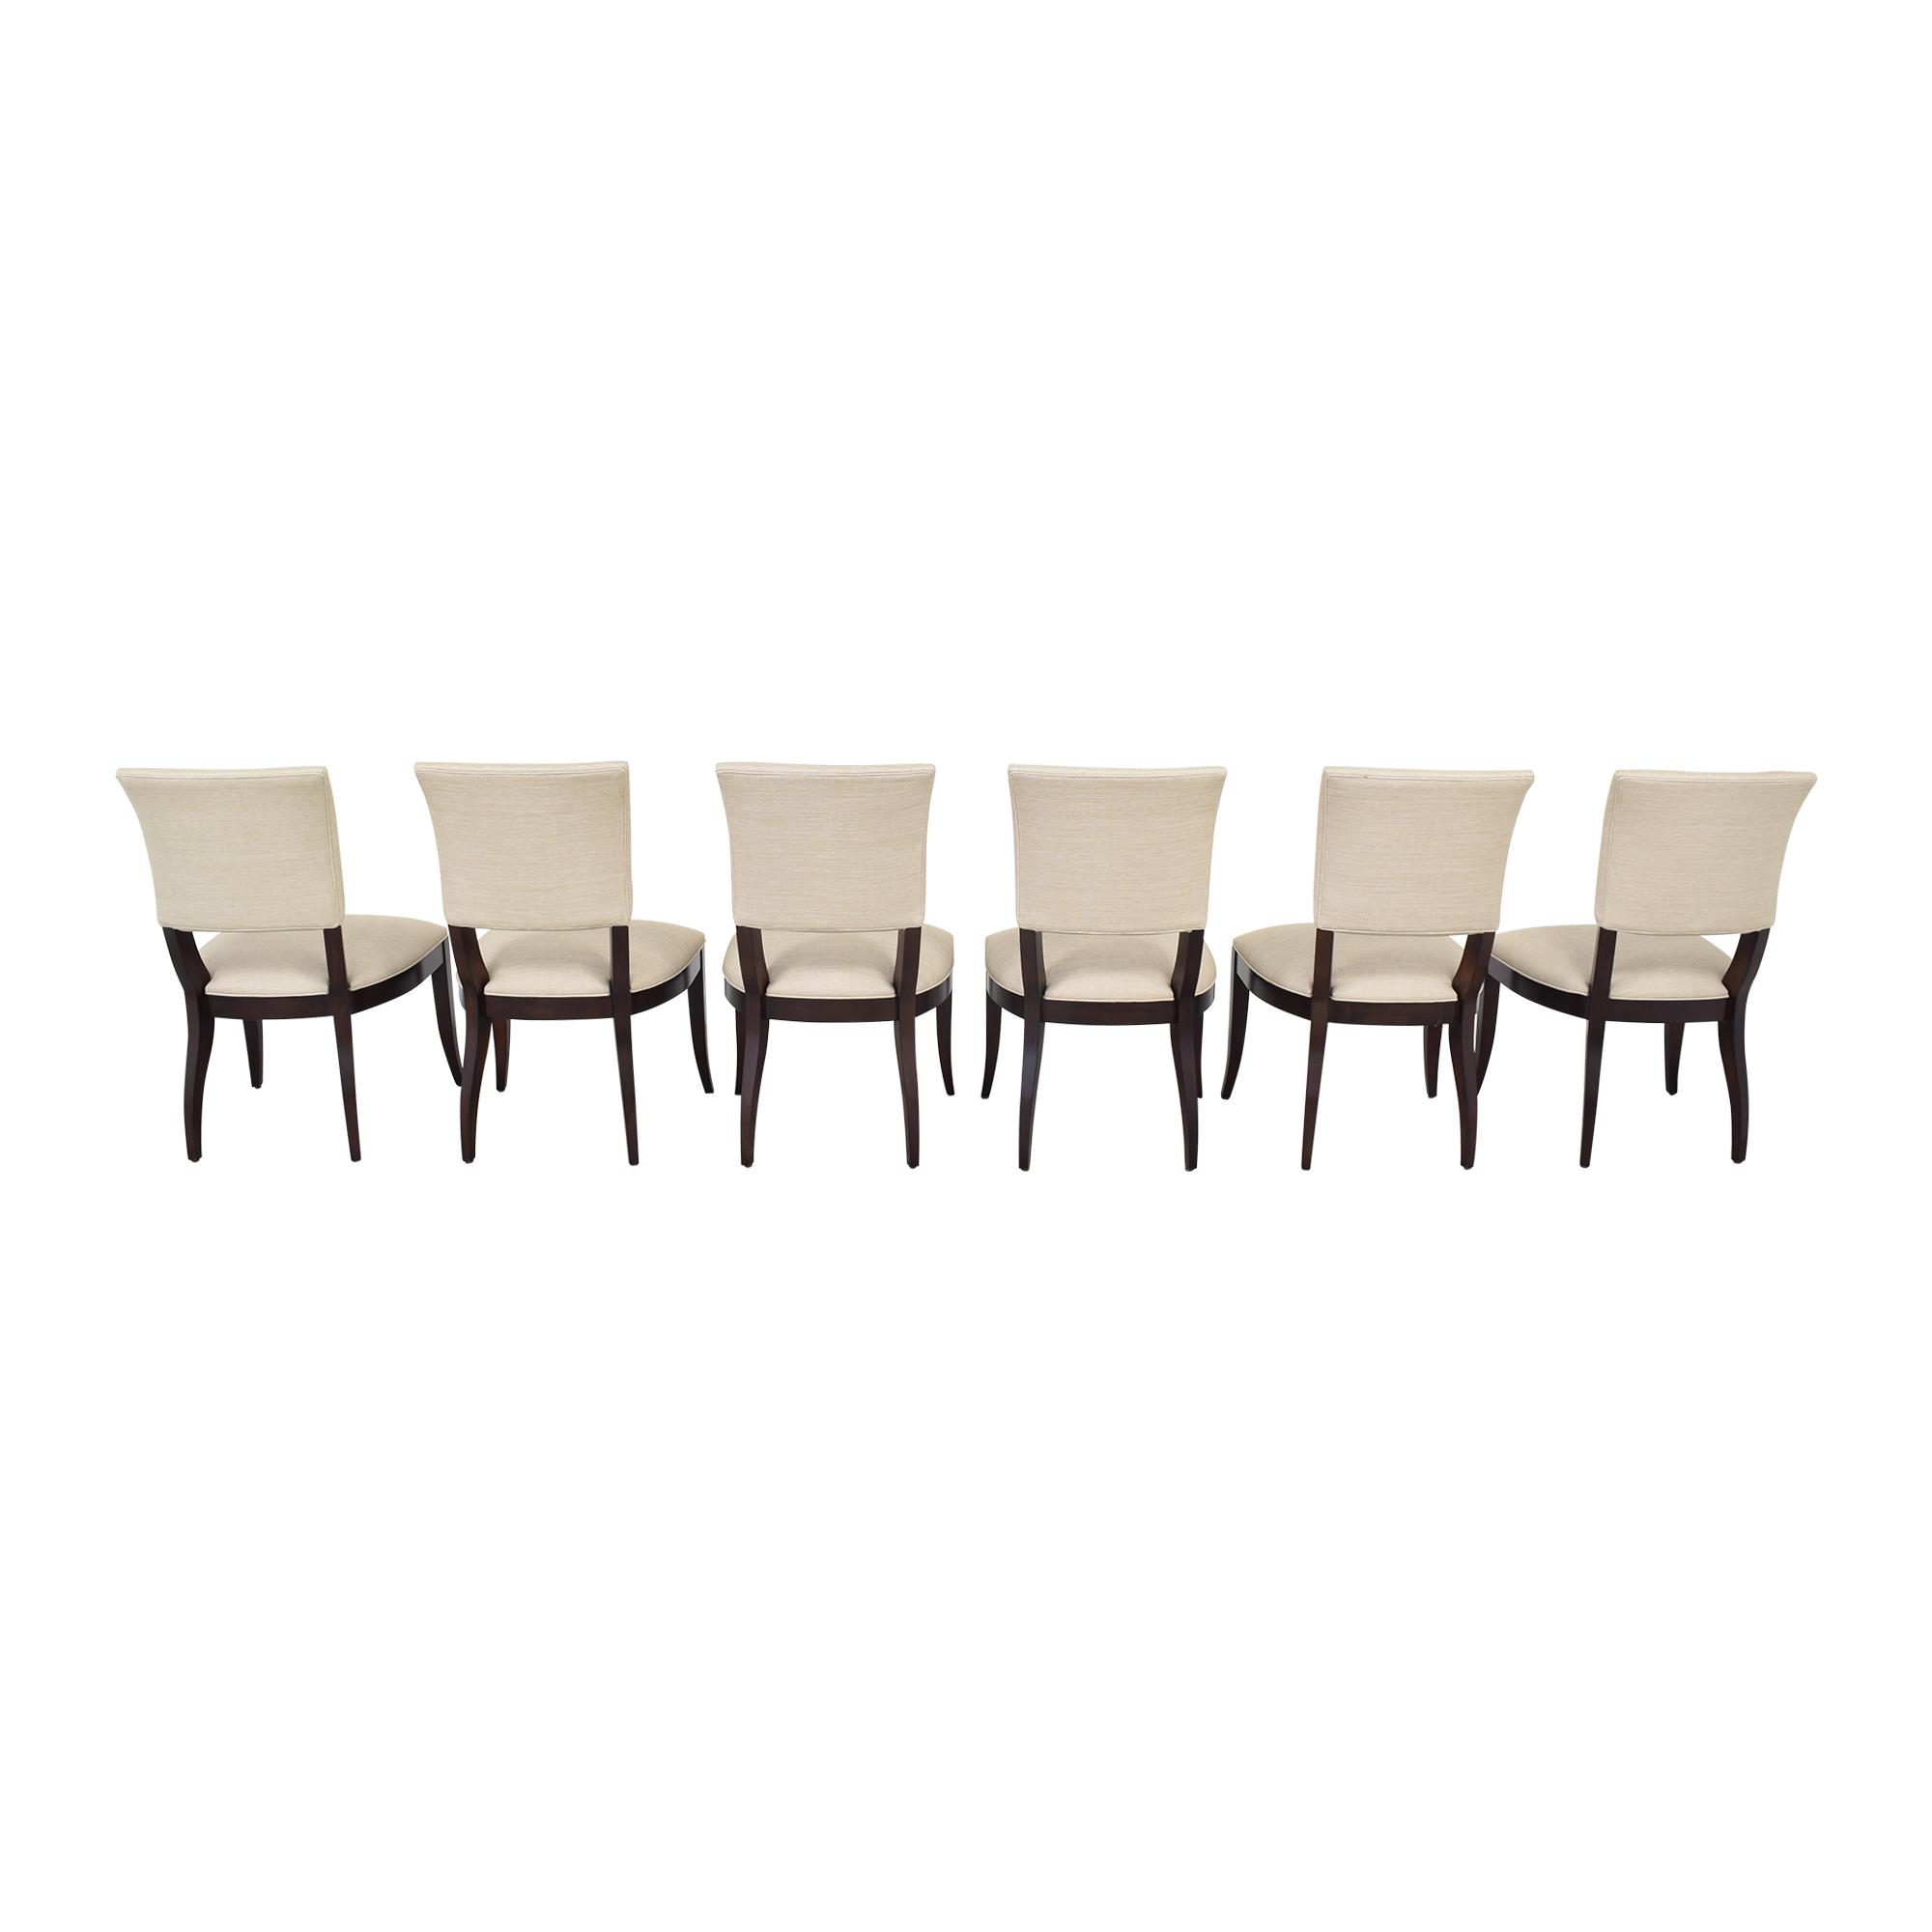 Ethan Allen Ethan Allen Drew Side Chairs dimensions